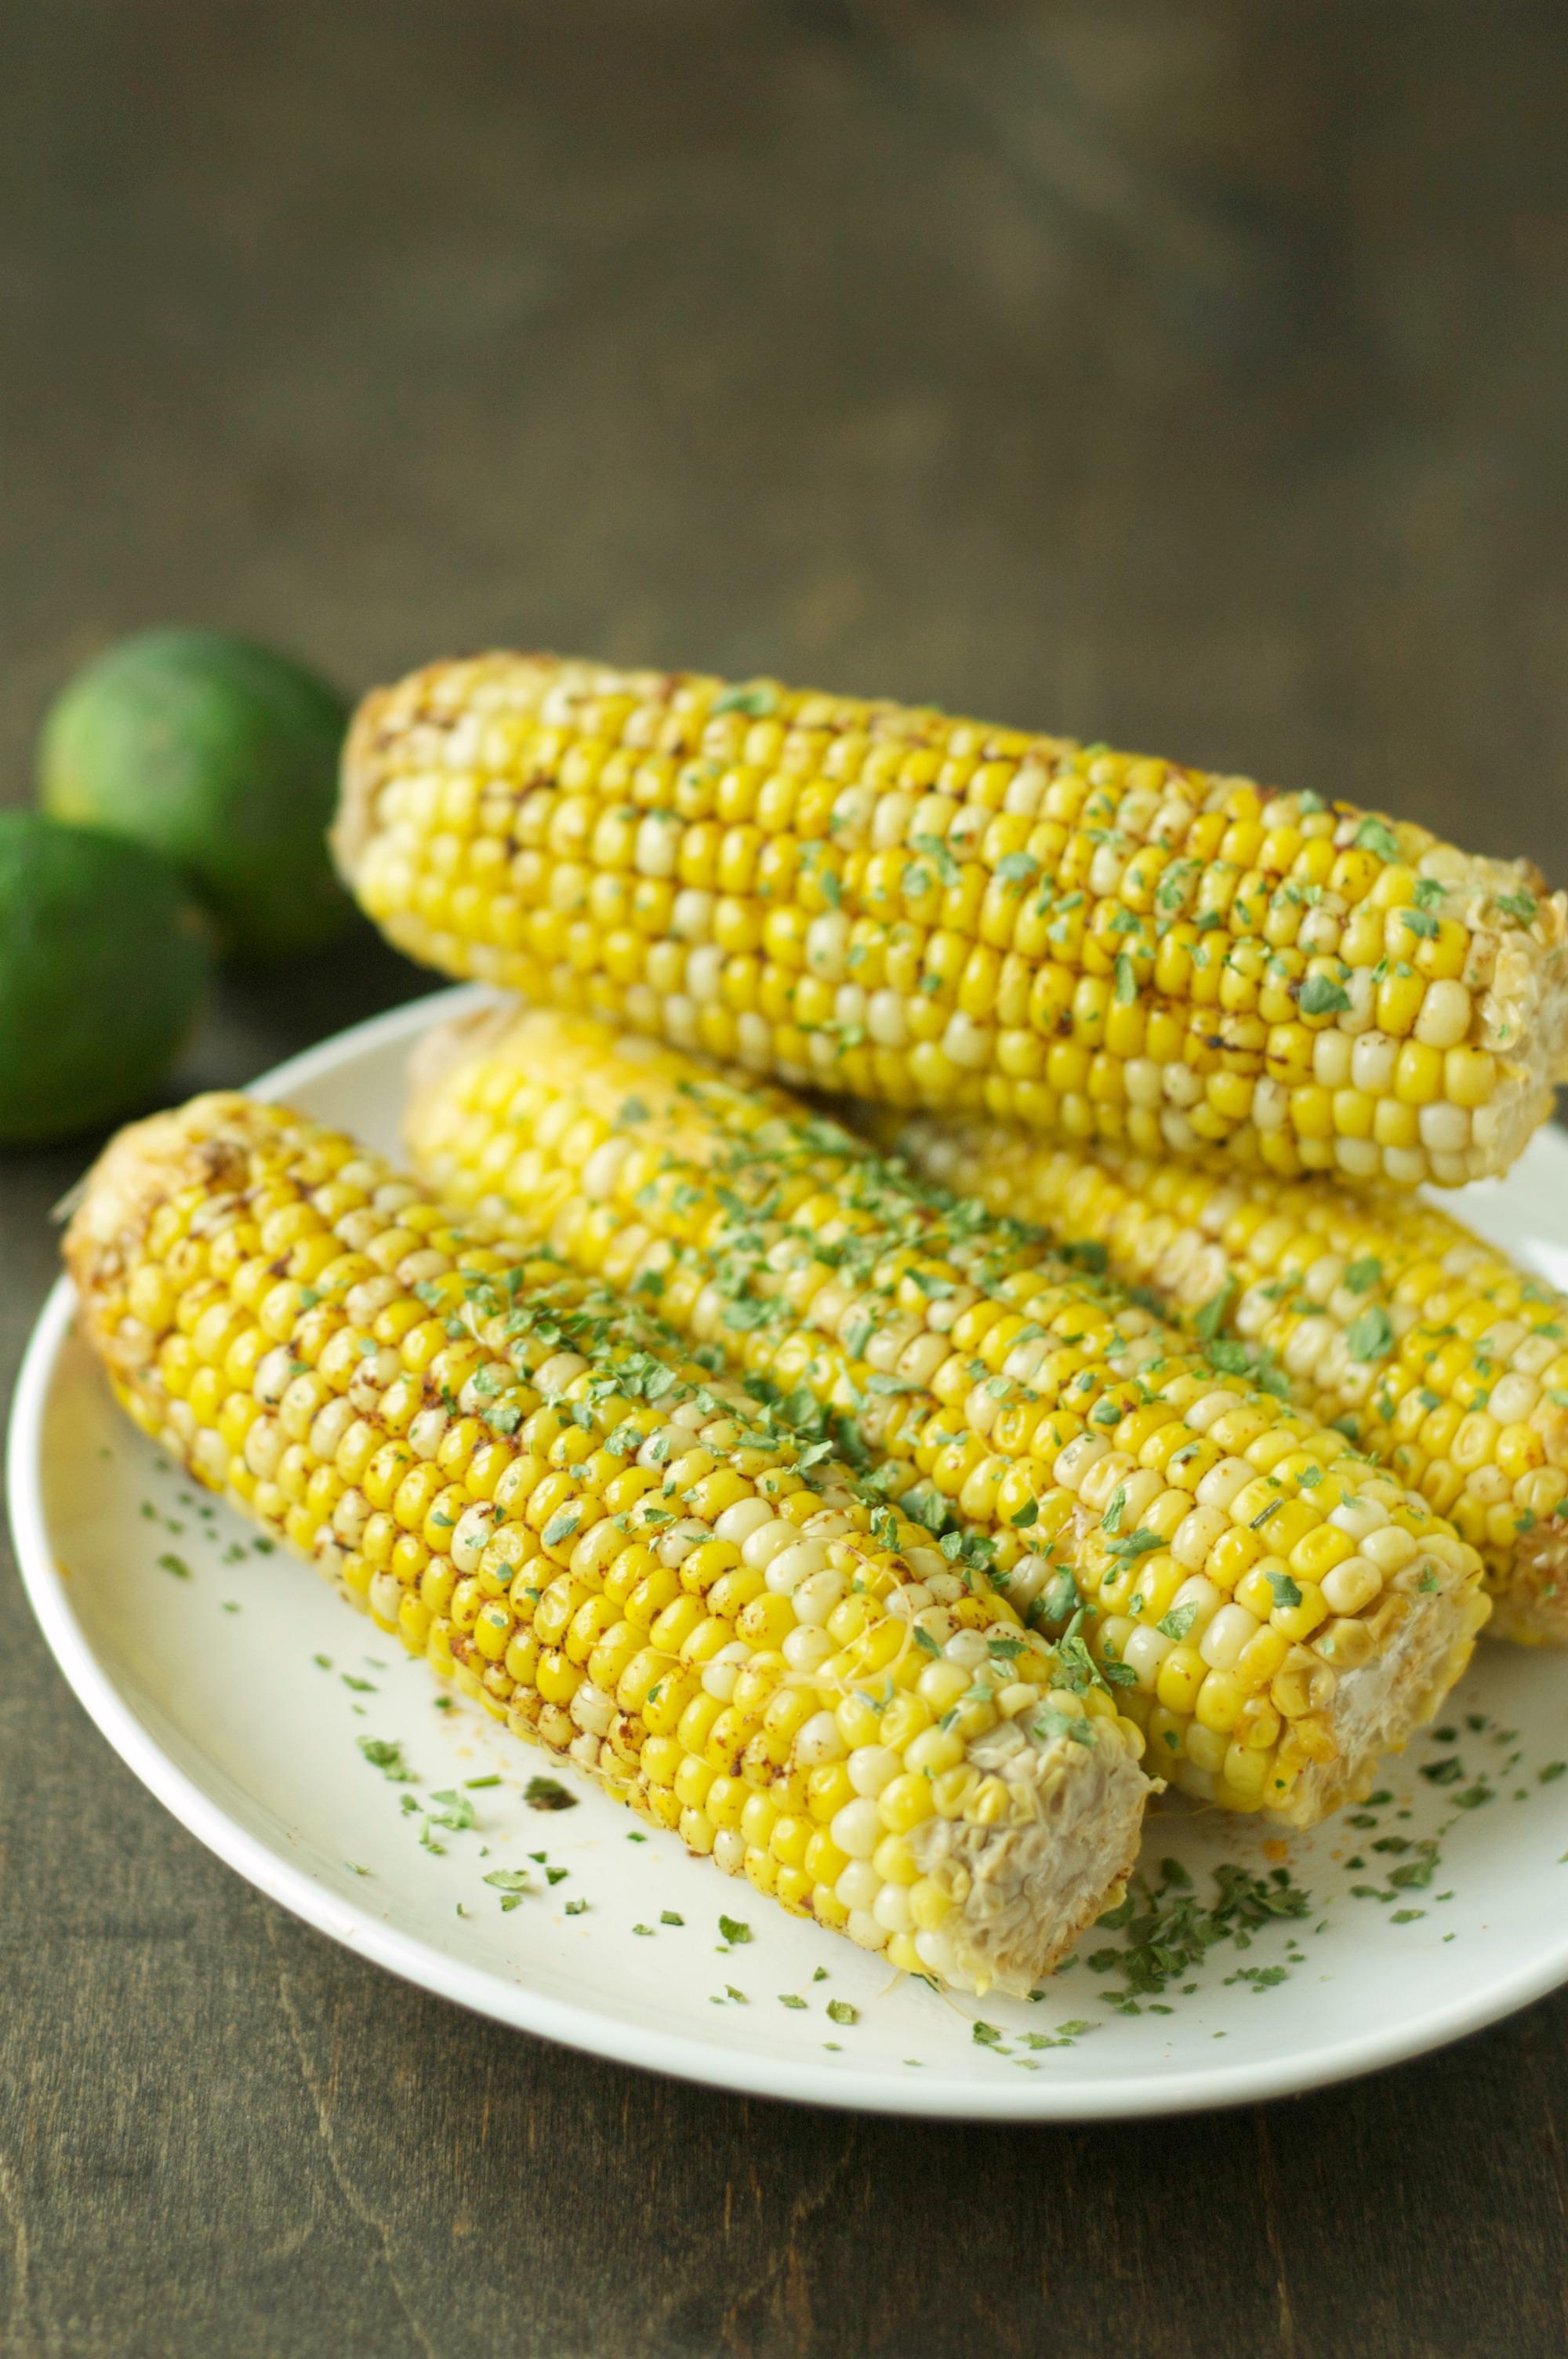 Crockpot Corn on the Cob with Chili Lime Butter | Crockpot ...